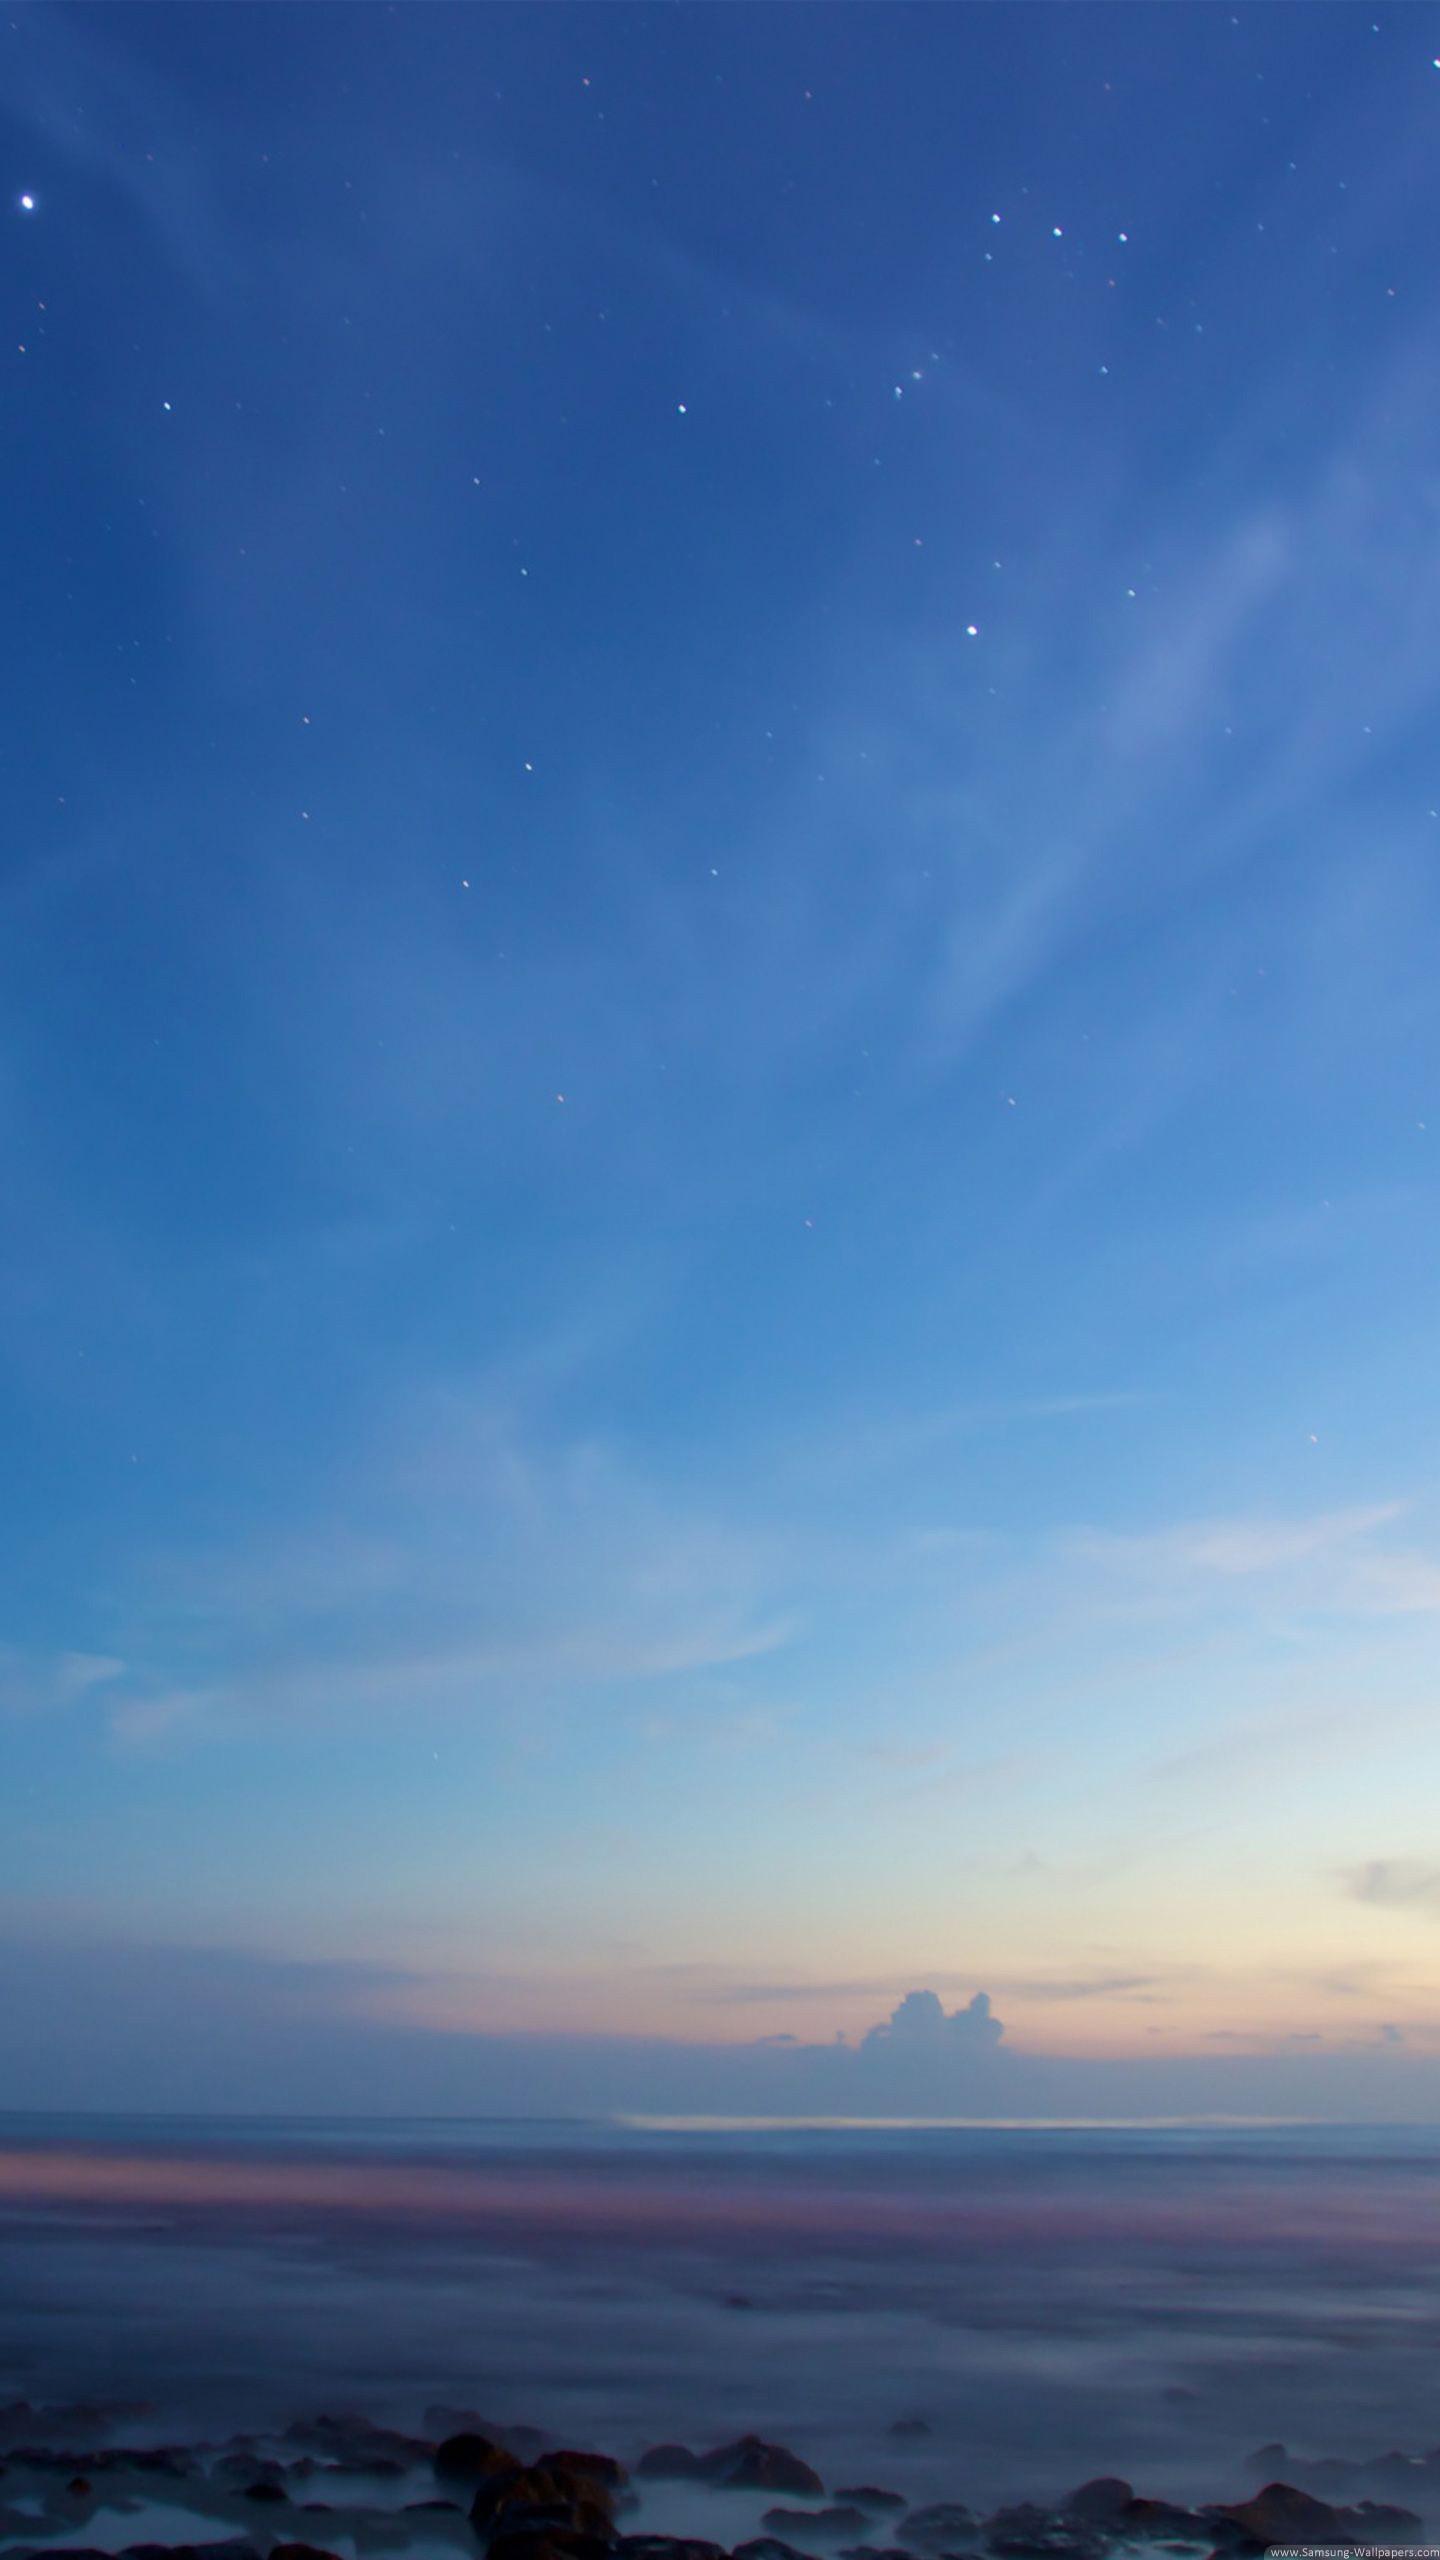 Beautiful Horizon Landscape Lock Screen Samsung Galaxy - 4k Iphone 7 Plus , HD Wallpaper & Backgrounds